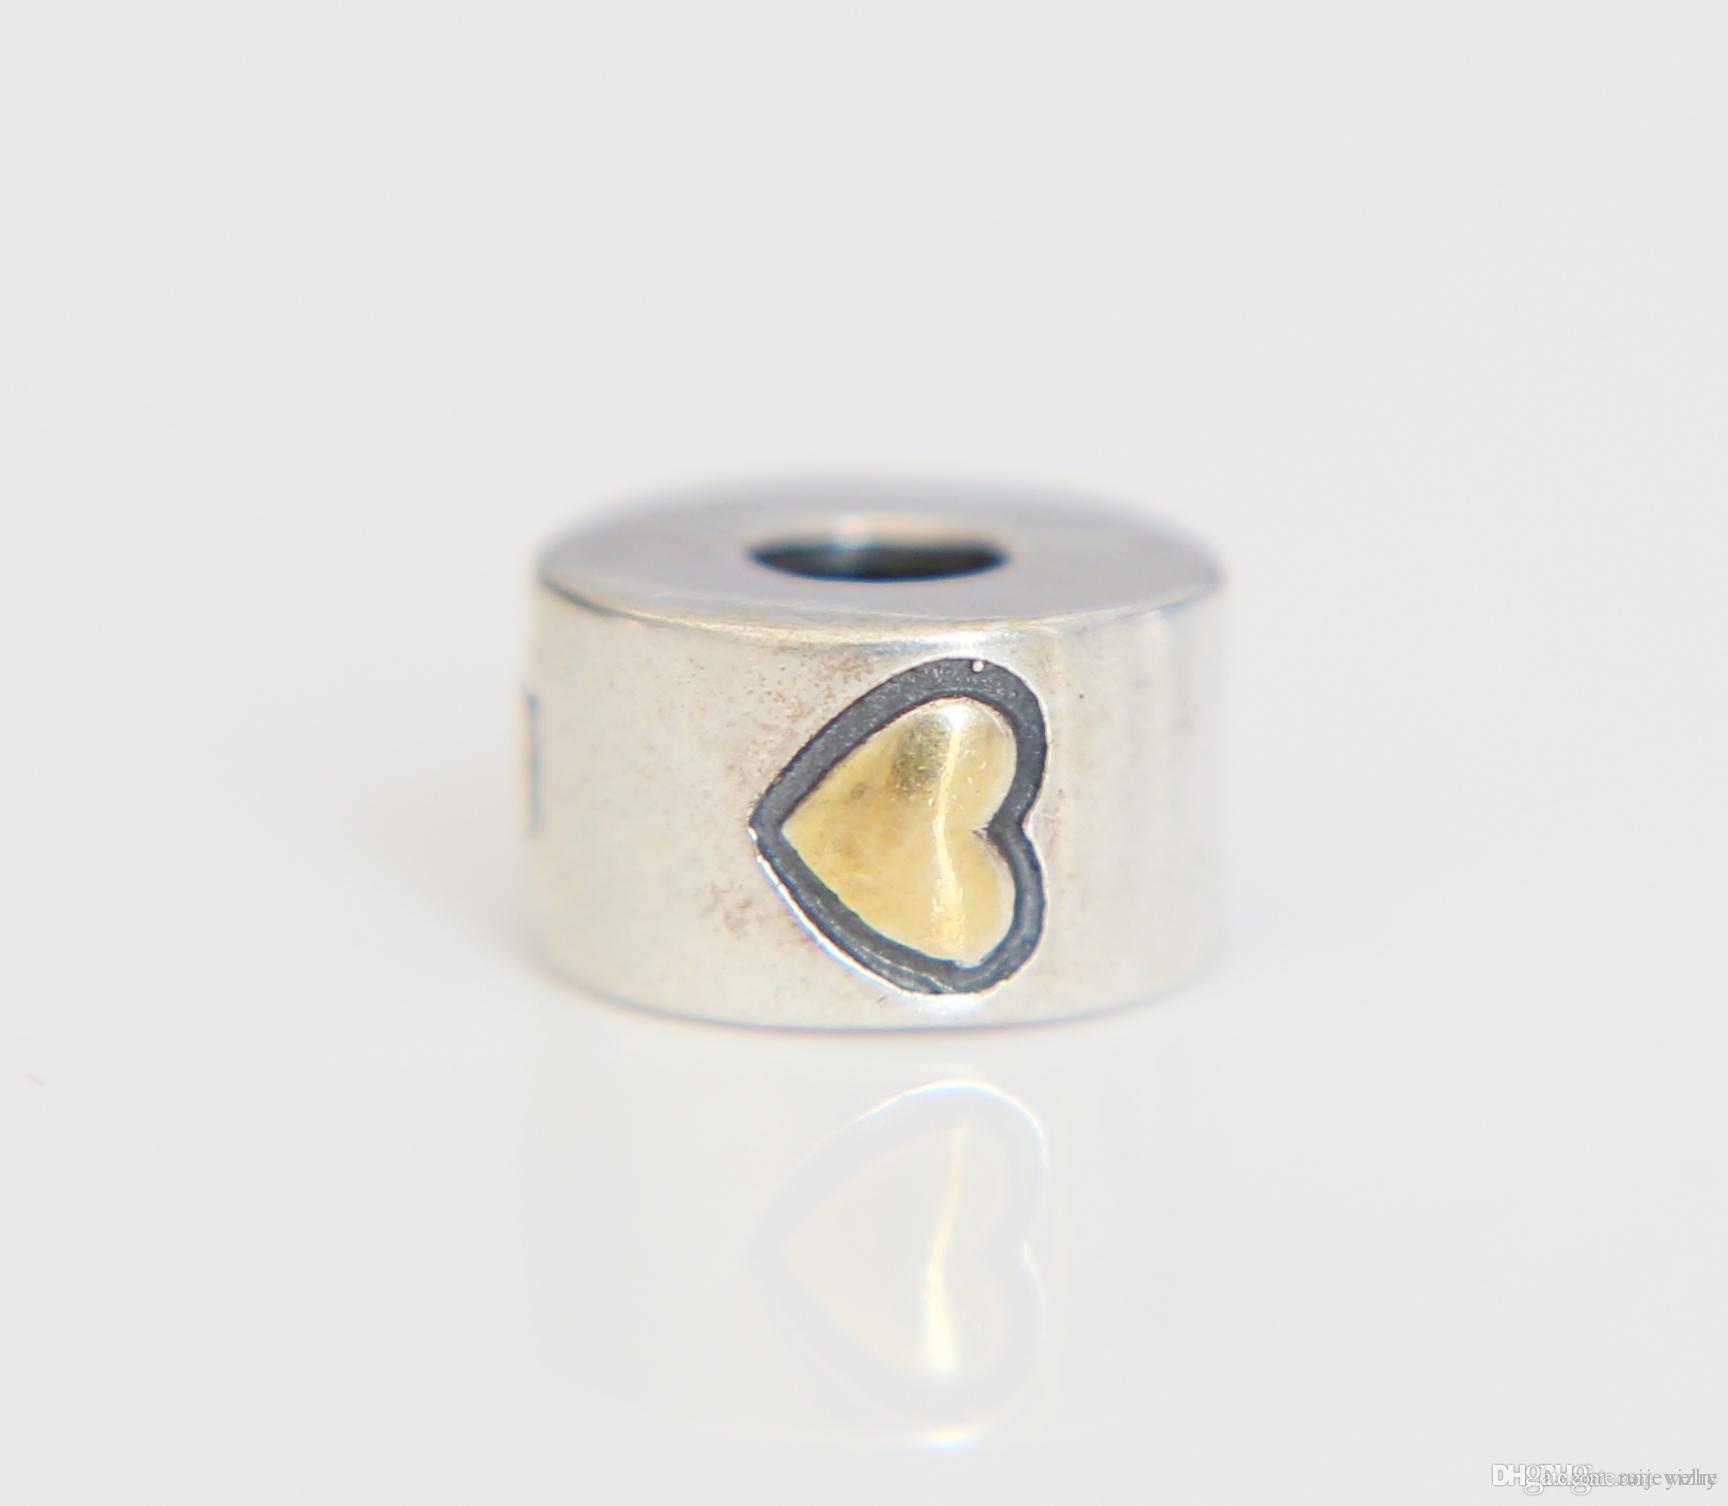 804baecf3 Original Authentic 100% 925 Sterling Silver Gold Heart Cz Clip Charm ...